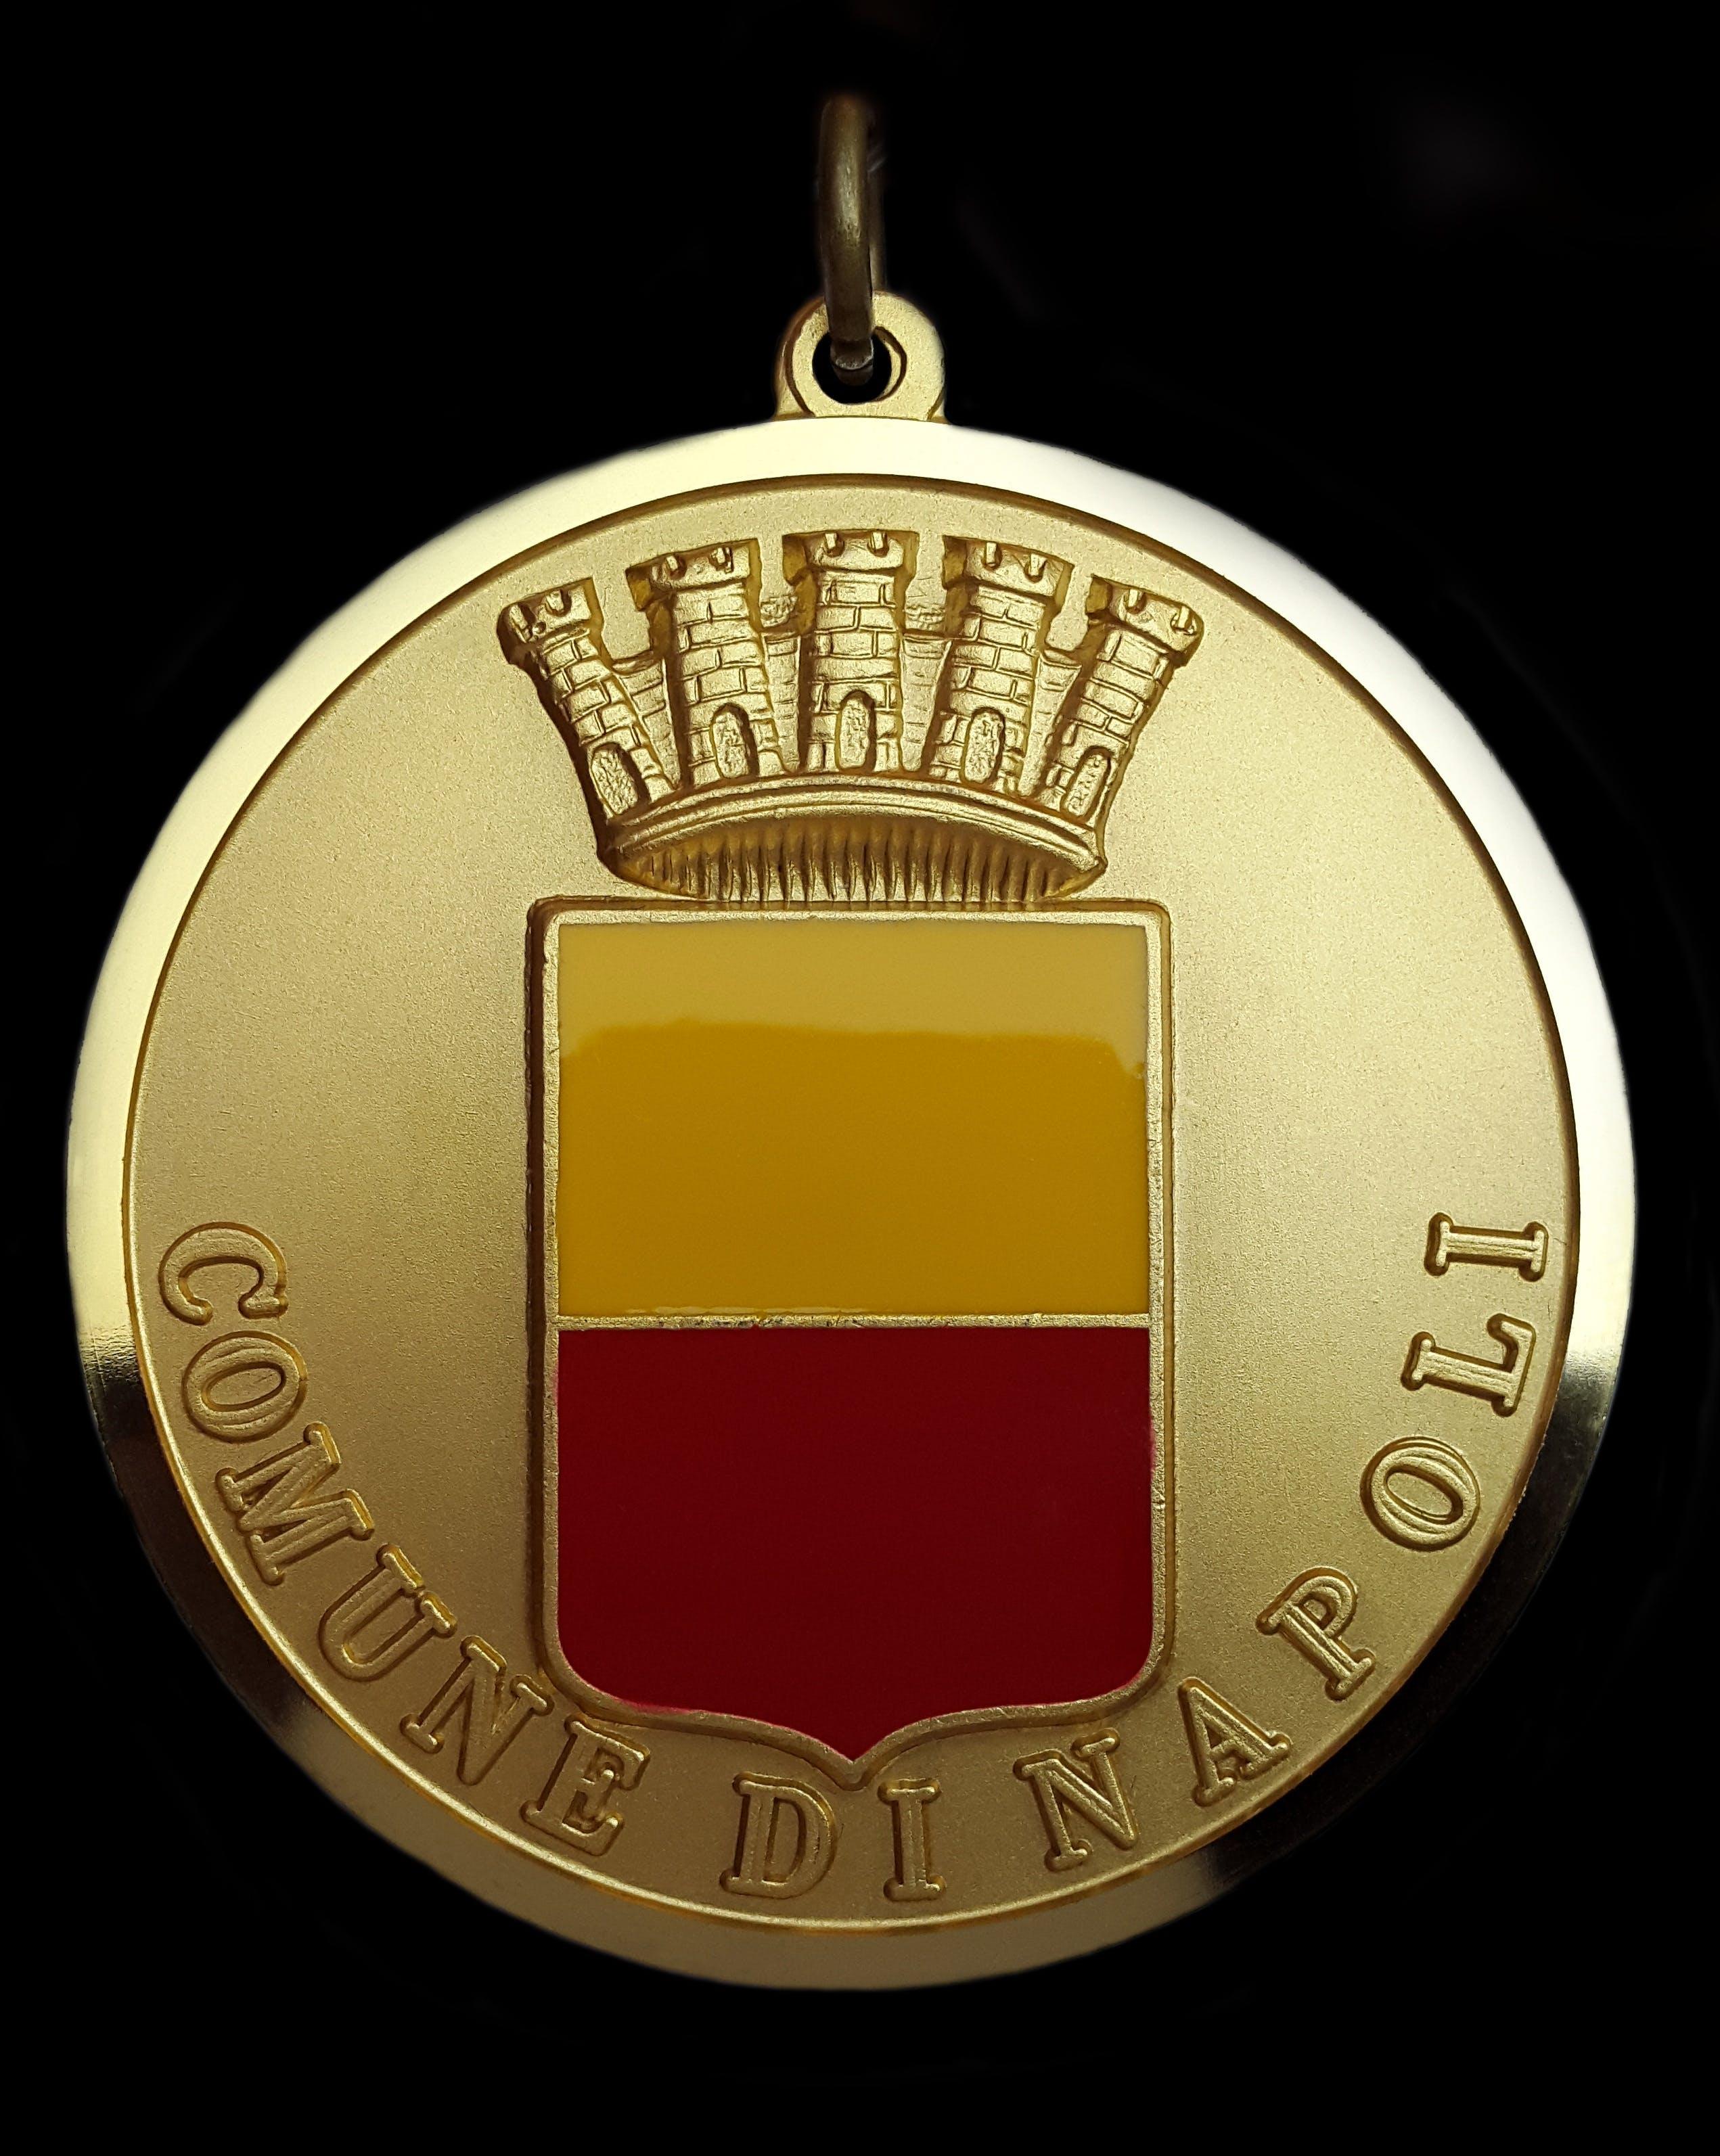 of award, badge, city, coat of arms